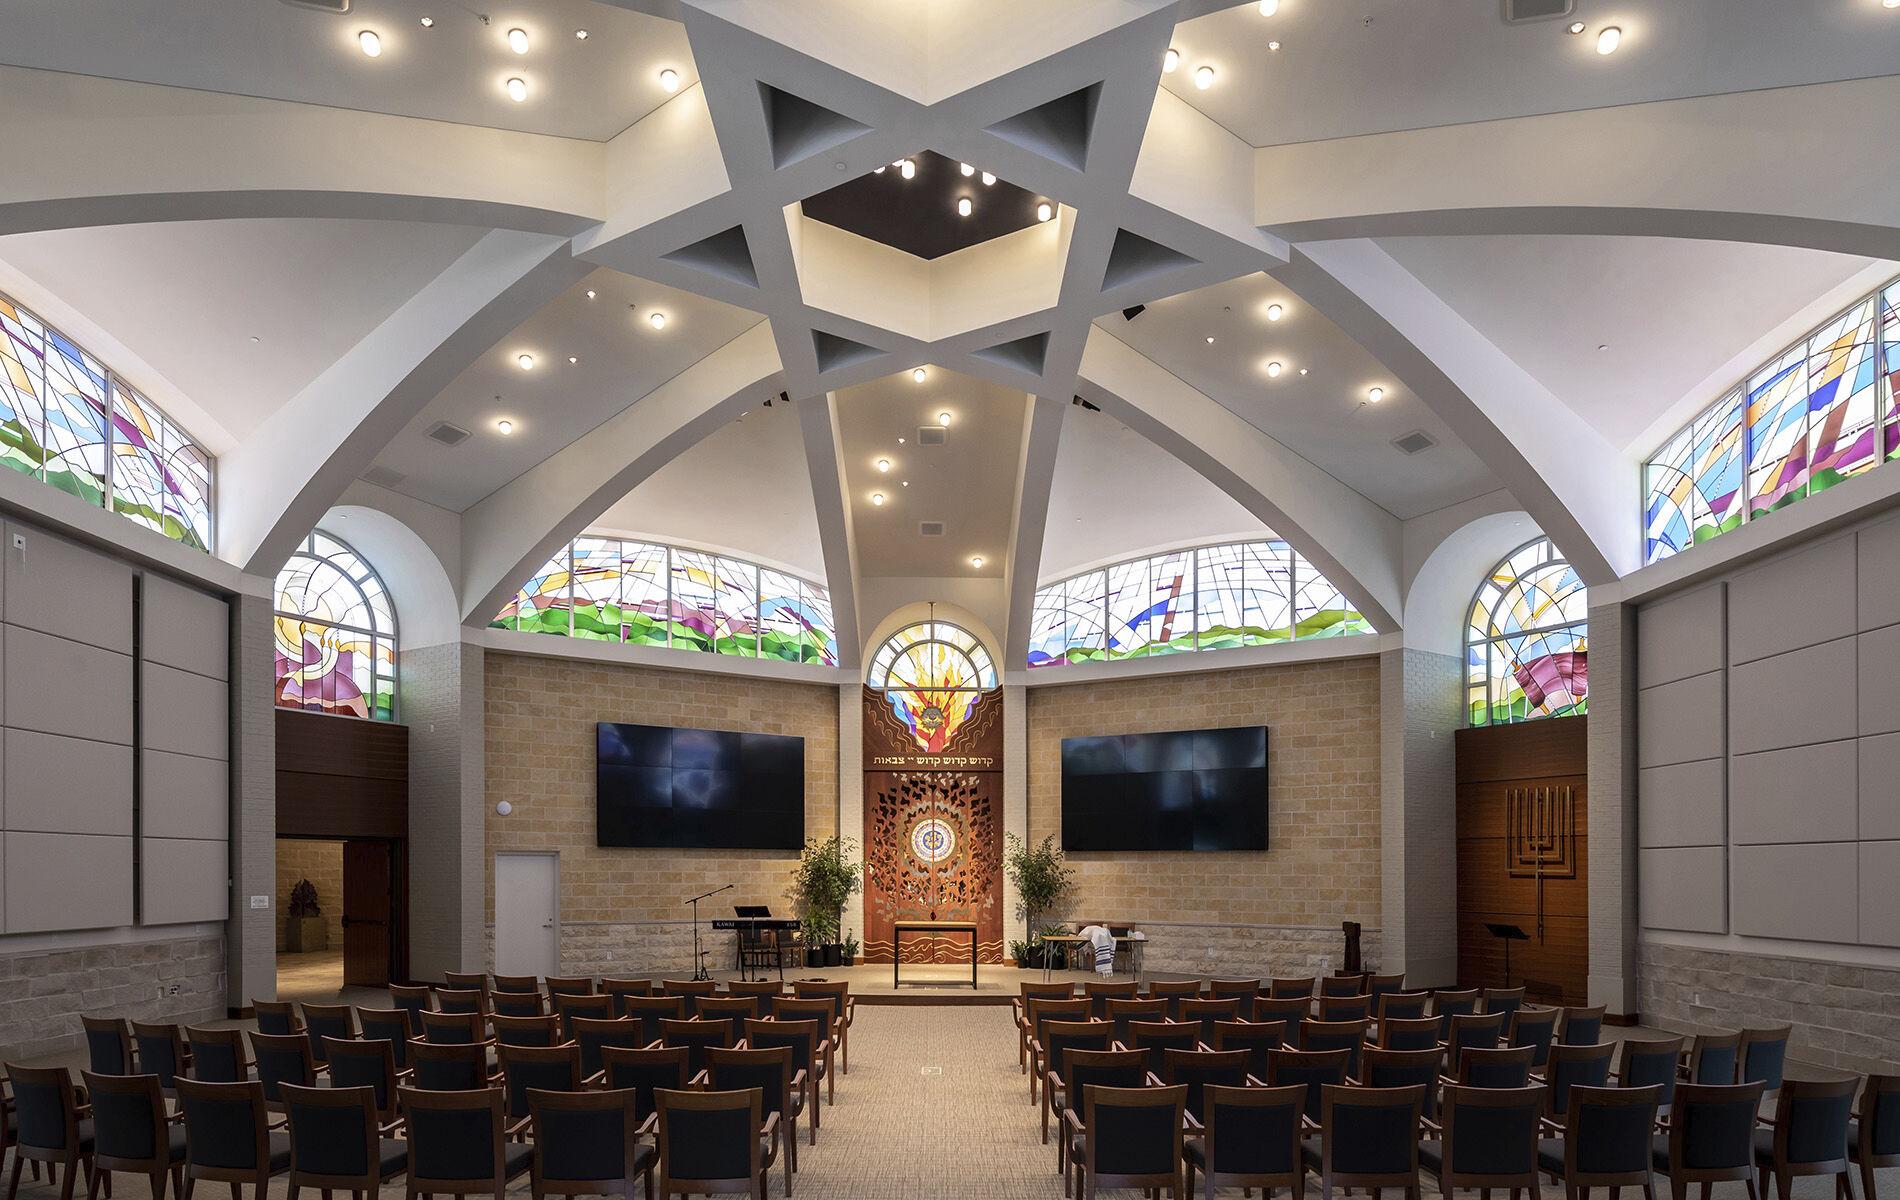 Temple Congregation B'nai Jehudah